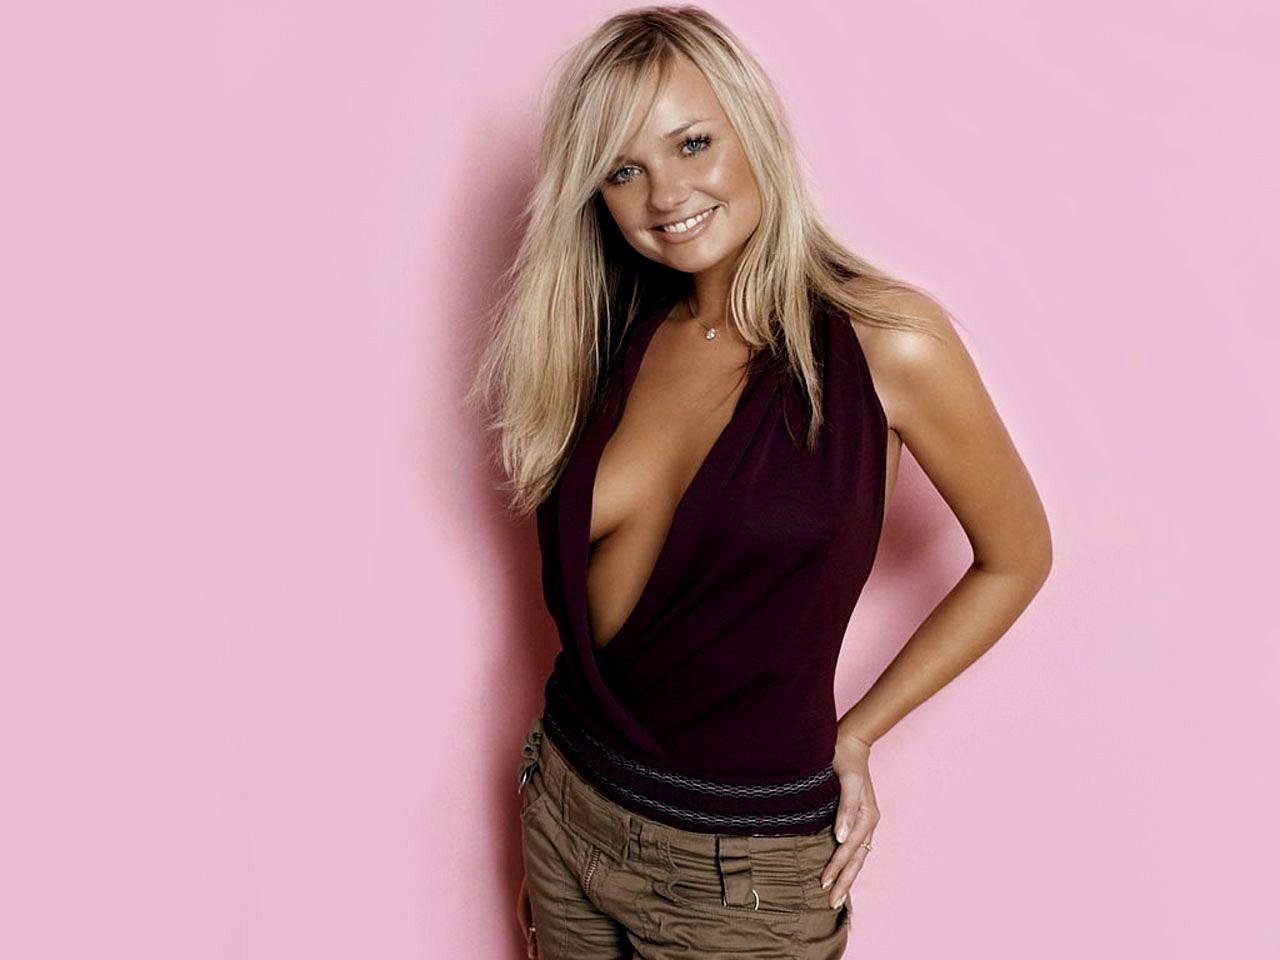 Emma bunton in lingerie